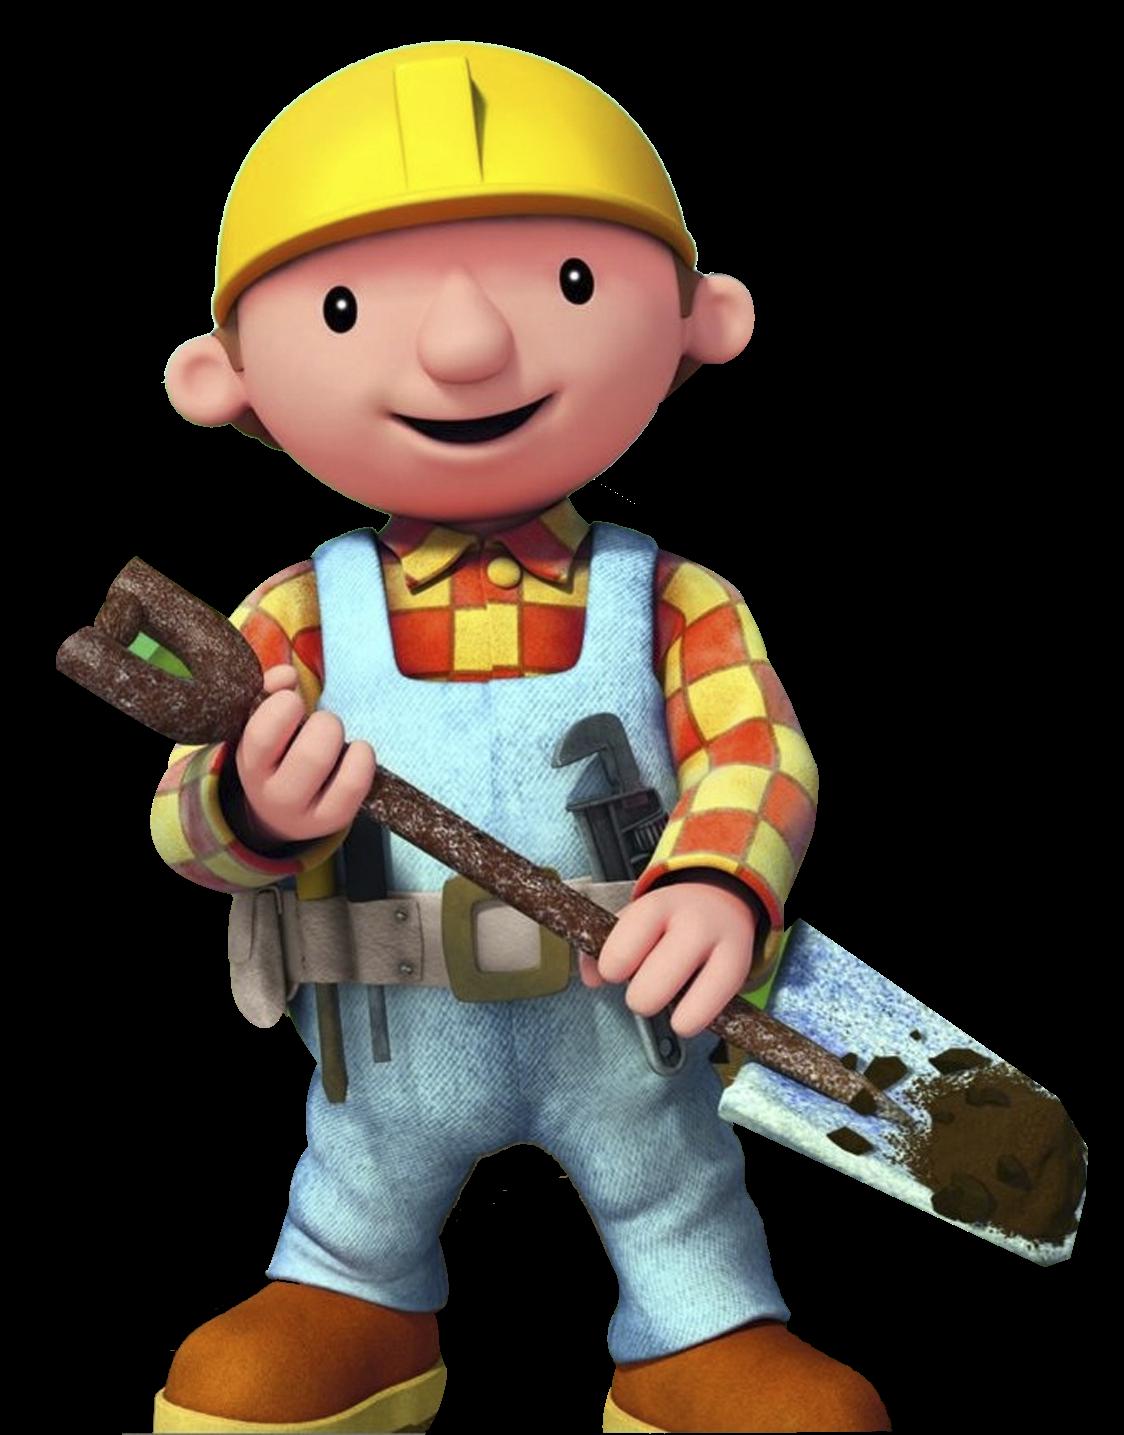 Bob Empe Png 1124 1435 Bob The Builder Bob Baby Development